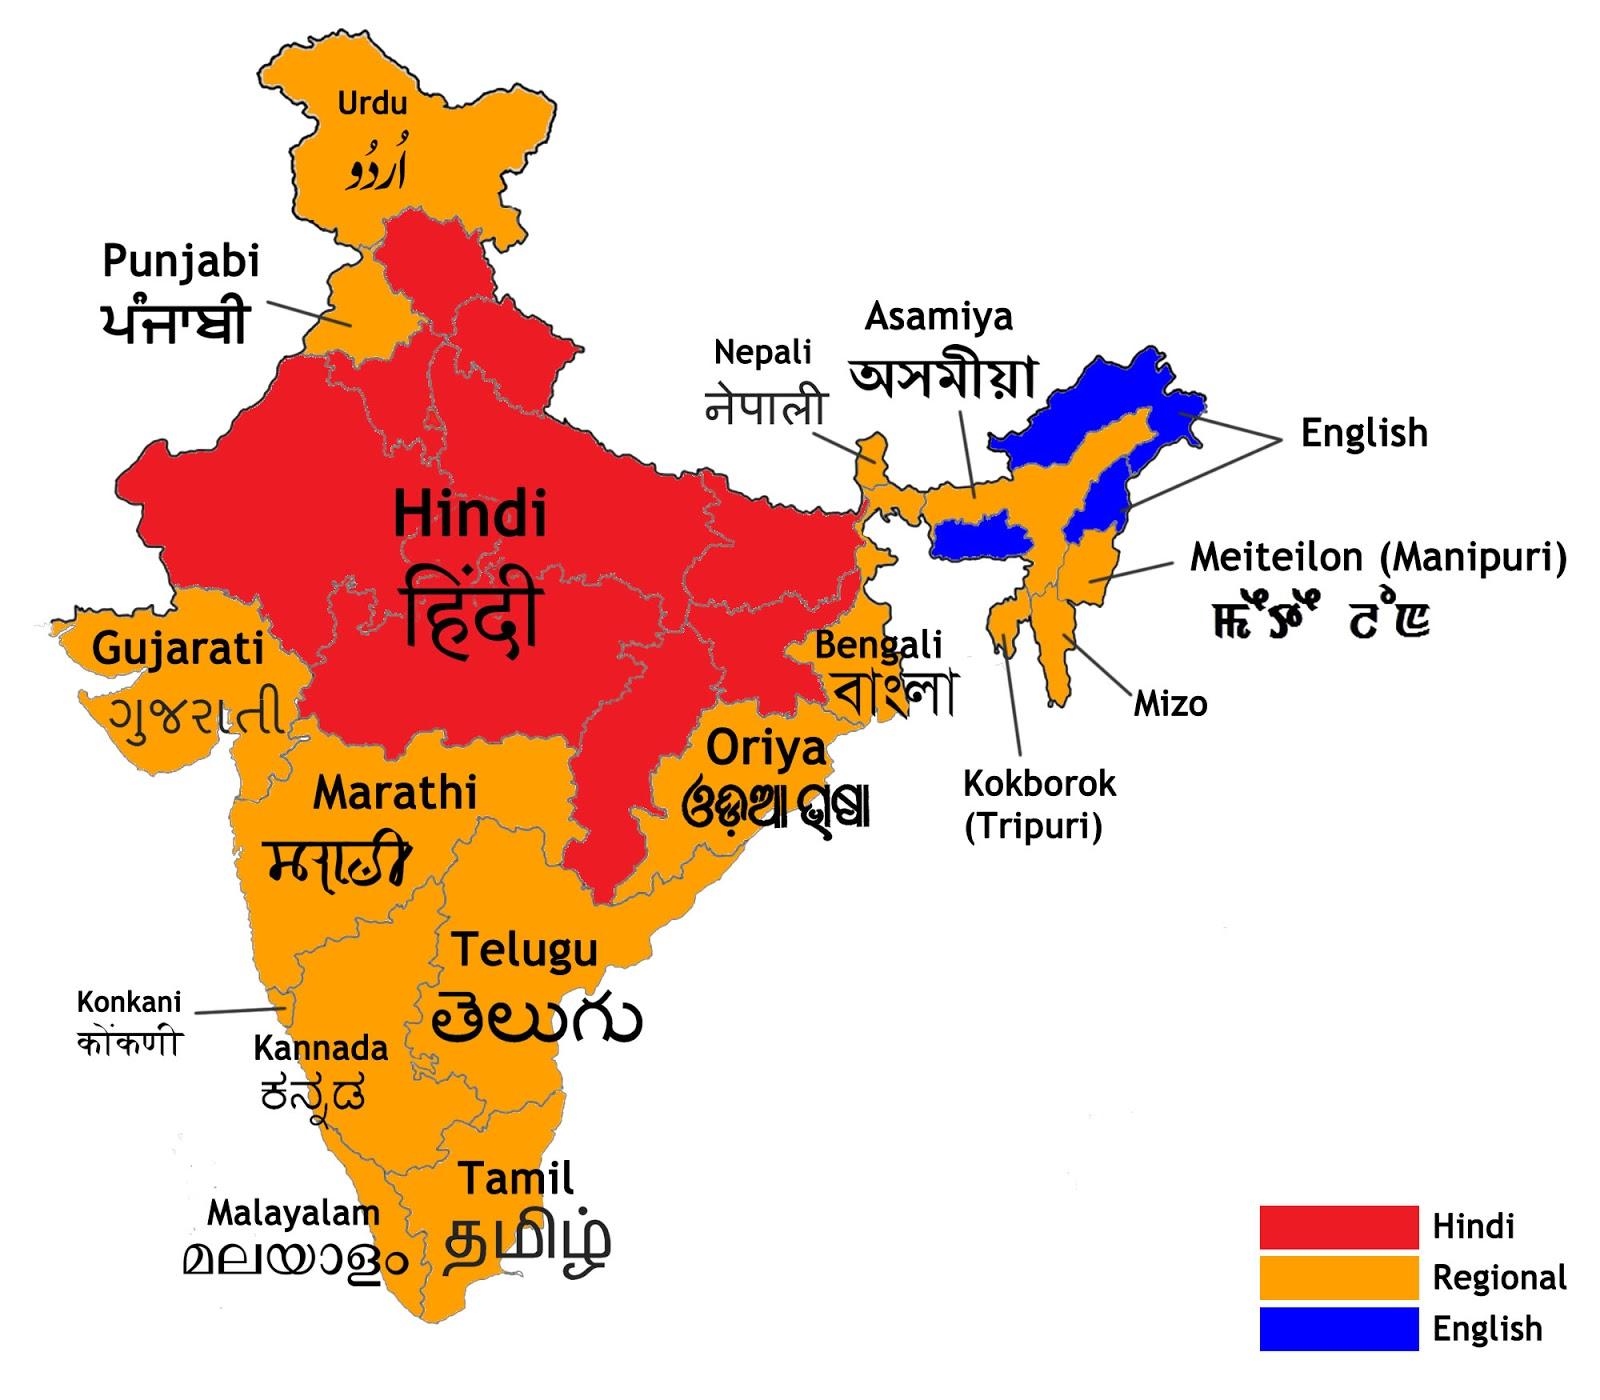 hindi diwas, shashi tharoor, shashi tharoor congress, is hindi our national language, hindi language north east, why do south indians not understand hindi, hindi language, shashi tharoor on hindi language, indian languages